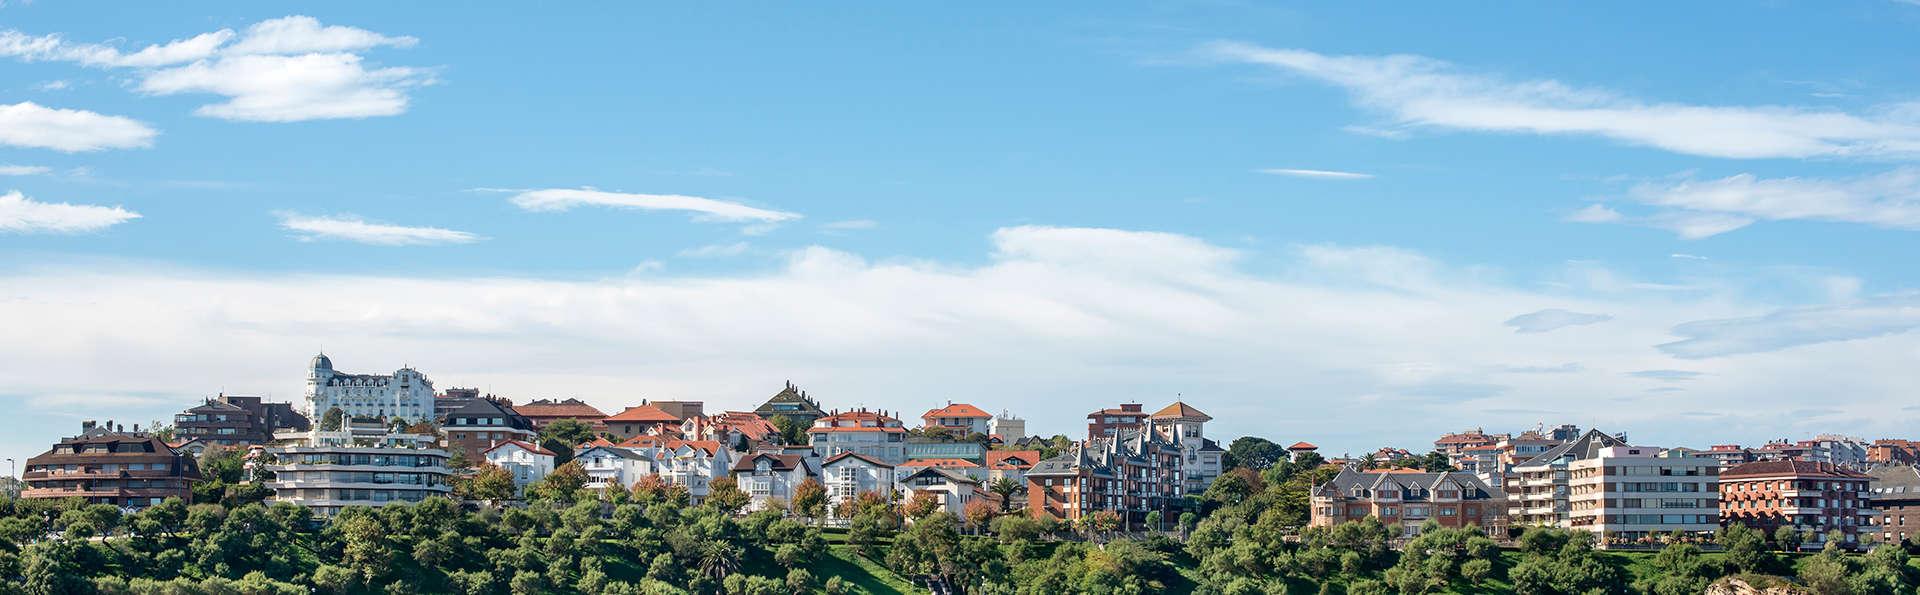 Hotel City Express Santander Parayas - EDIT_destination2.jpg